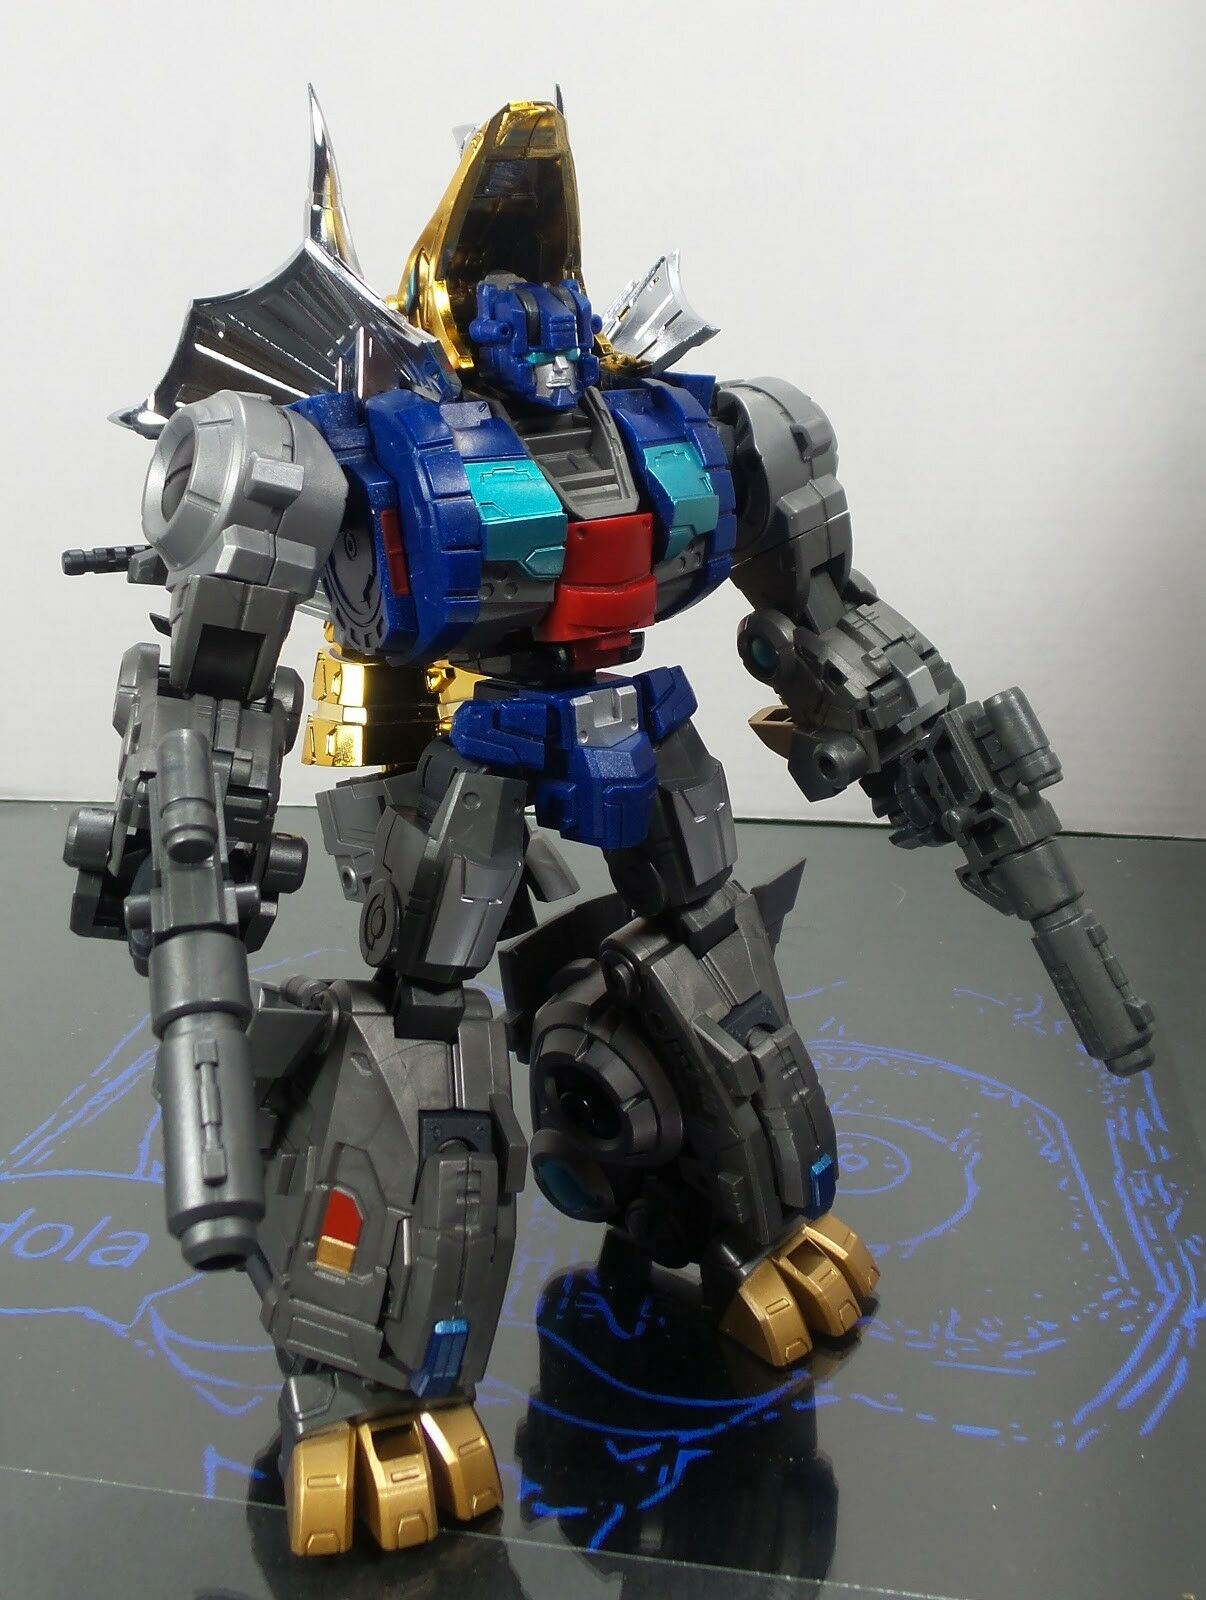 Transformadores Fansproject Diaclone Dinobots G1 Custom tercero cubrar escoria